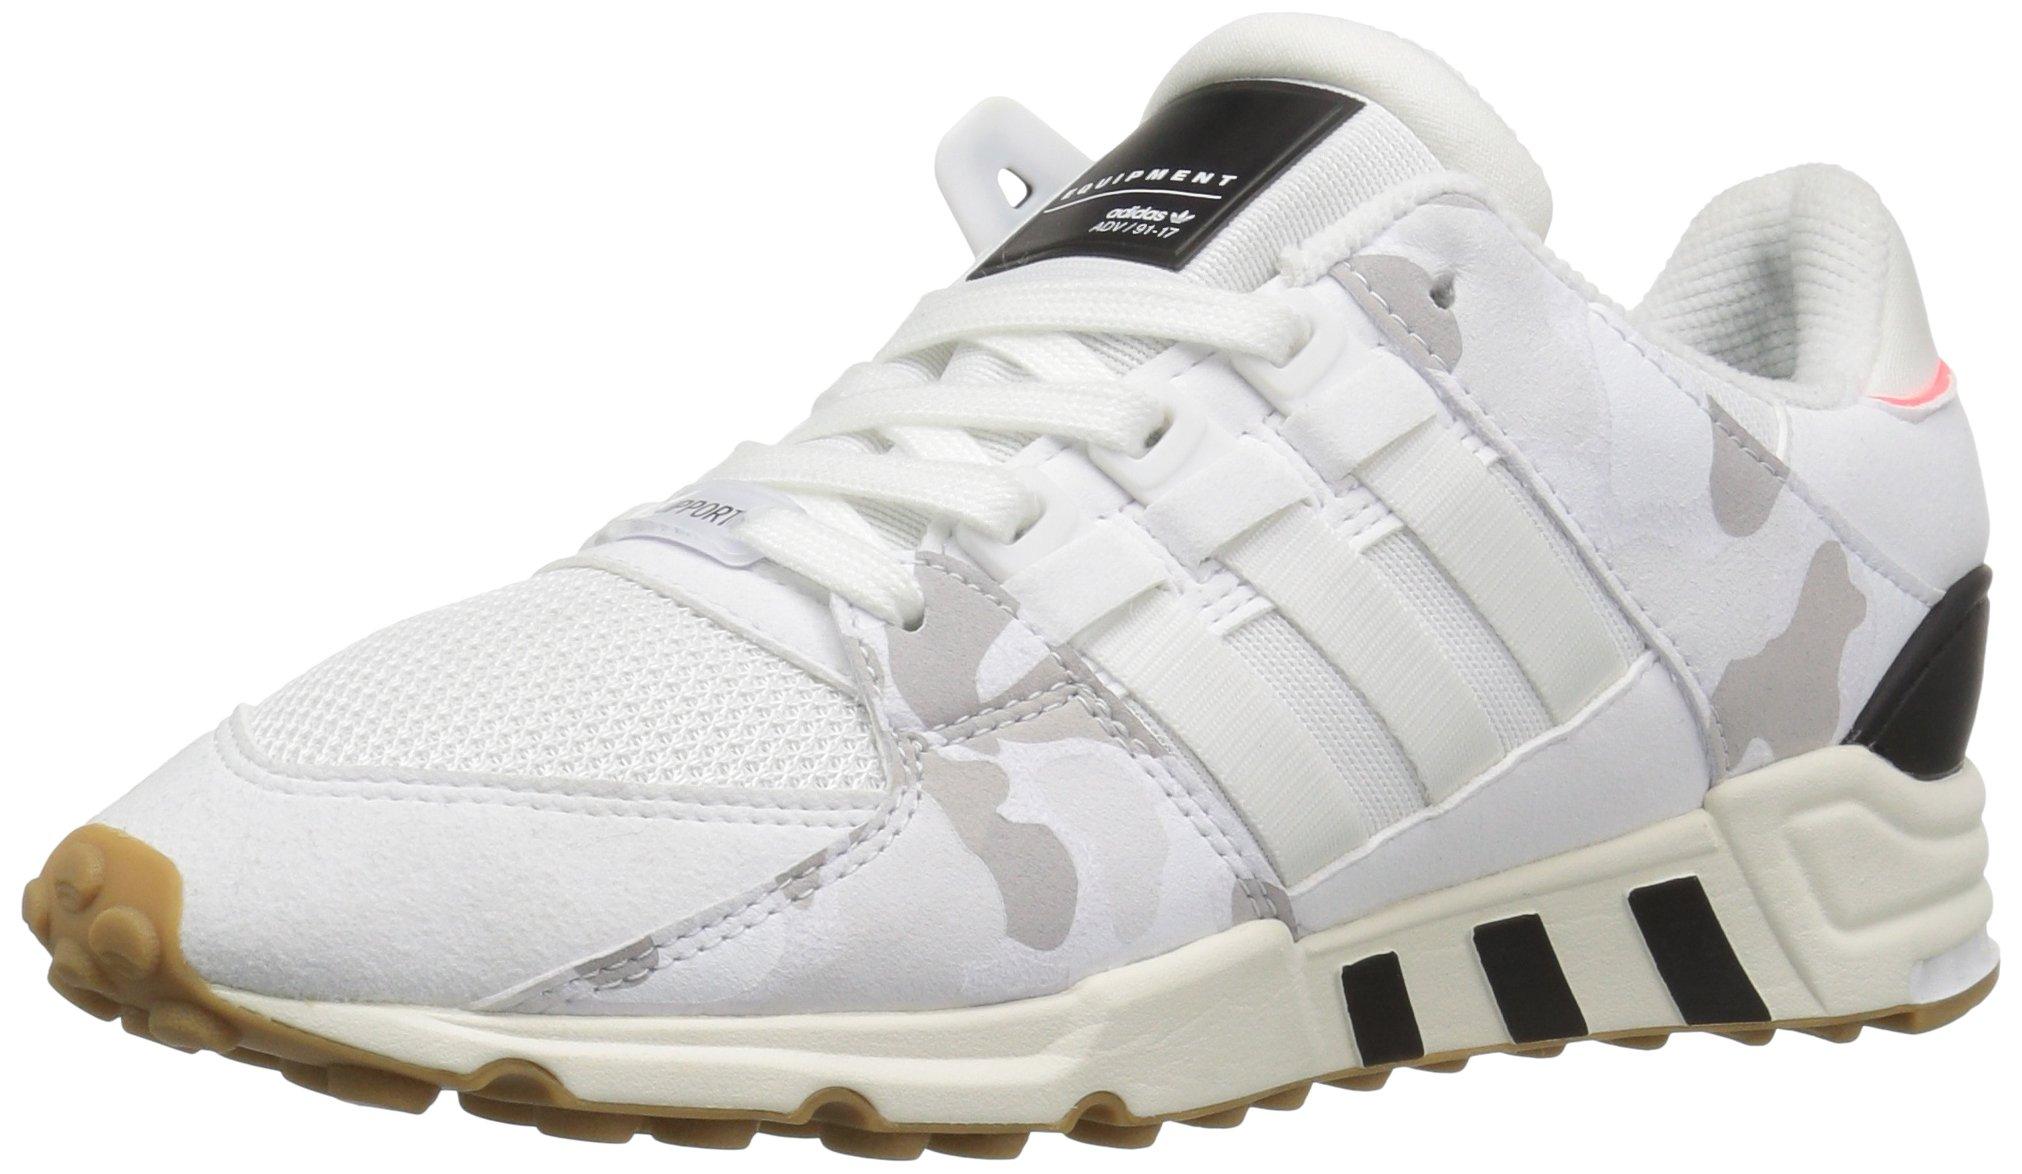 new concept 2e952 401b6 Galleon - Adidas Originals Mens EQT Support RF Fashion Sneaker,  WhiteLegacy  Black 1, (13 M US)